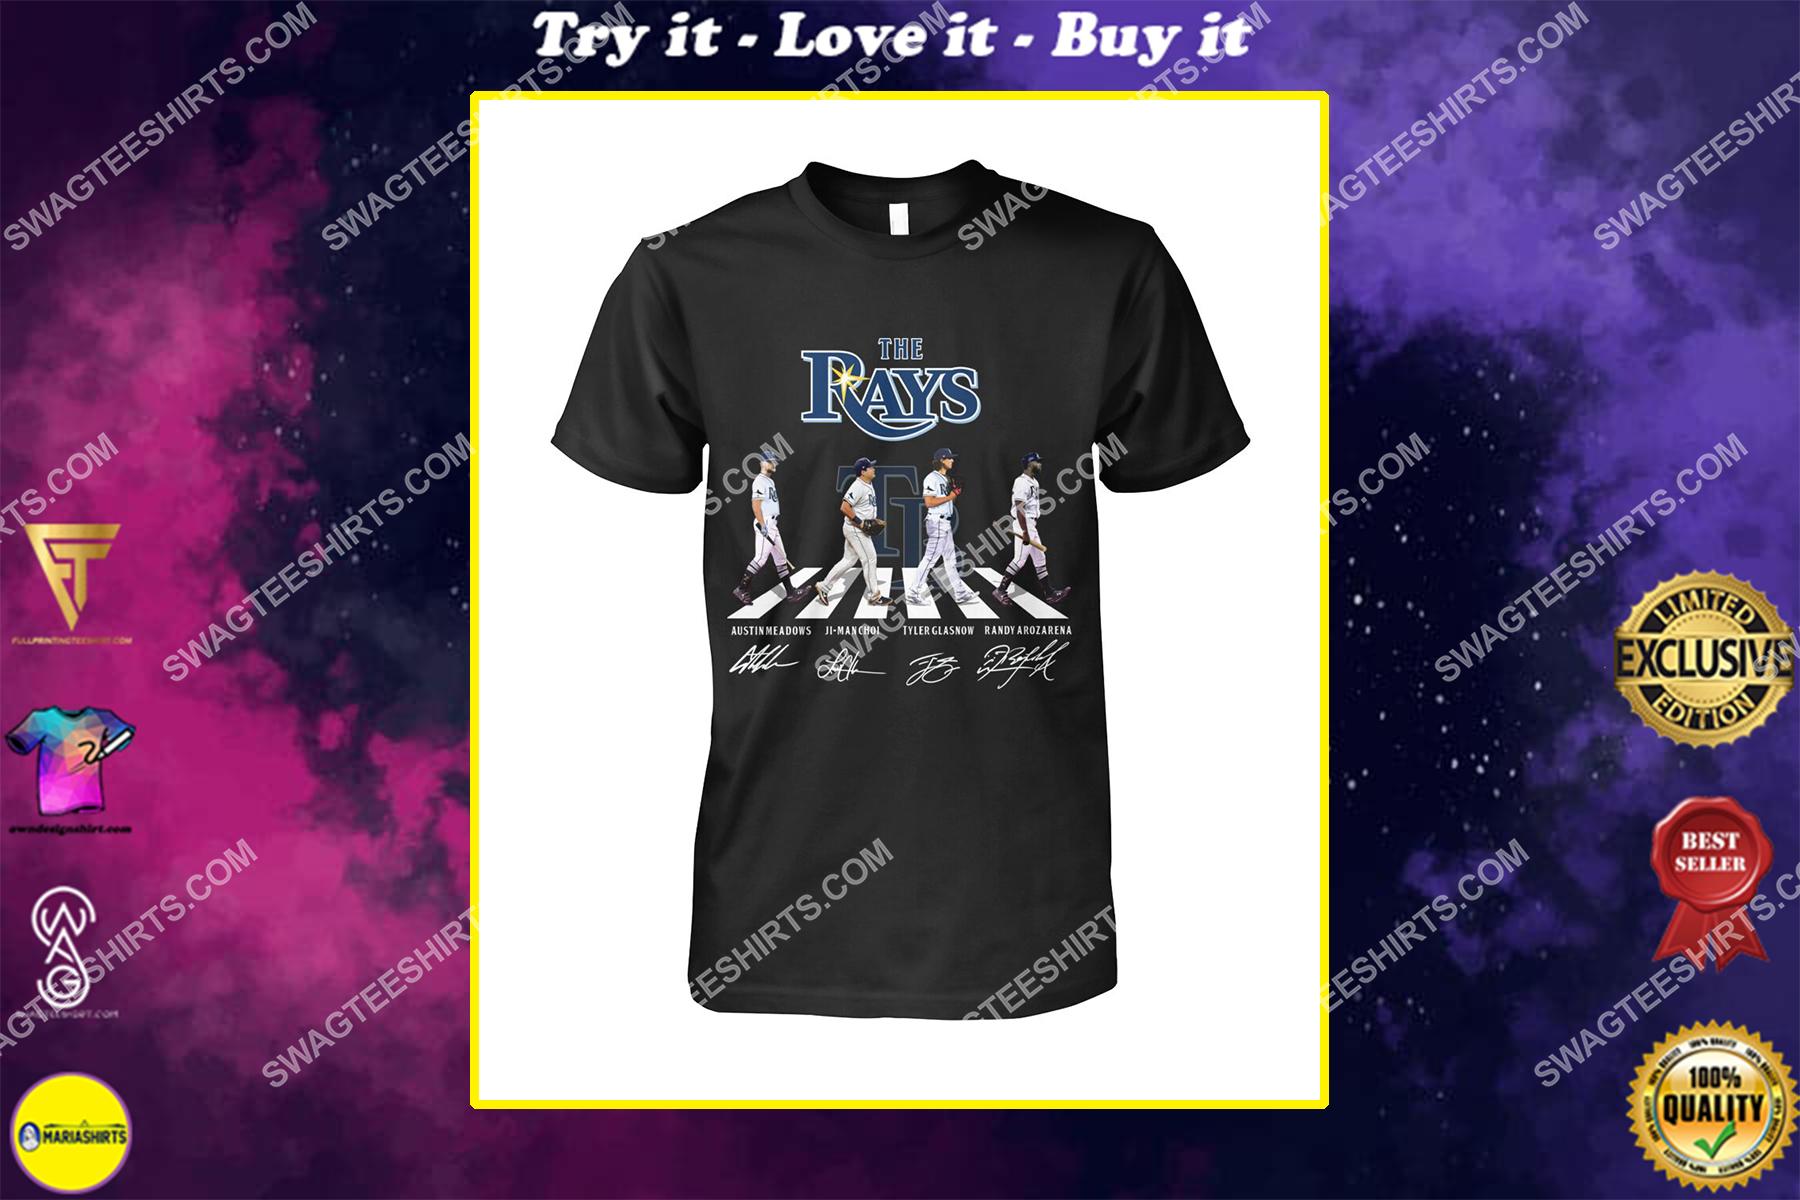 the tampa bay rays walking abbey road shirt